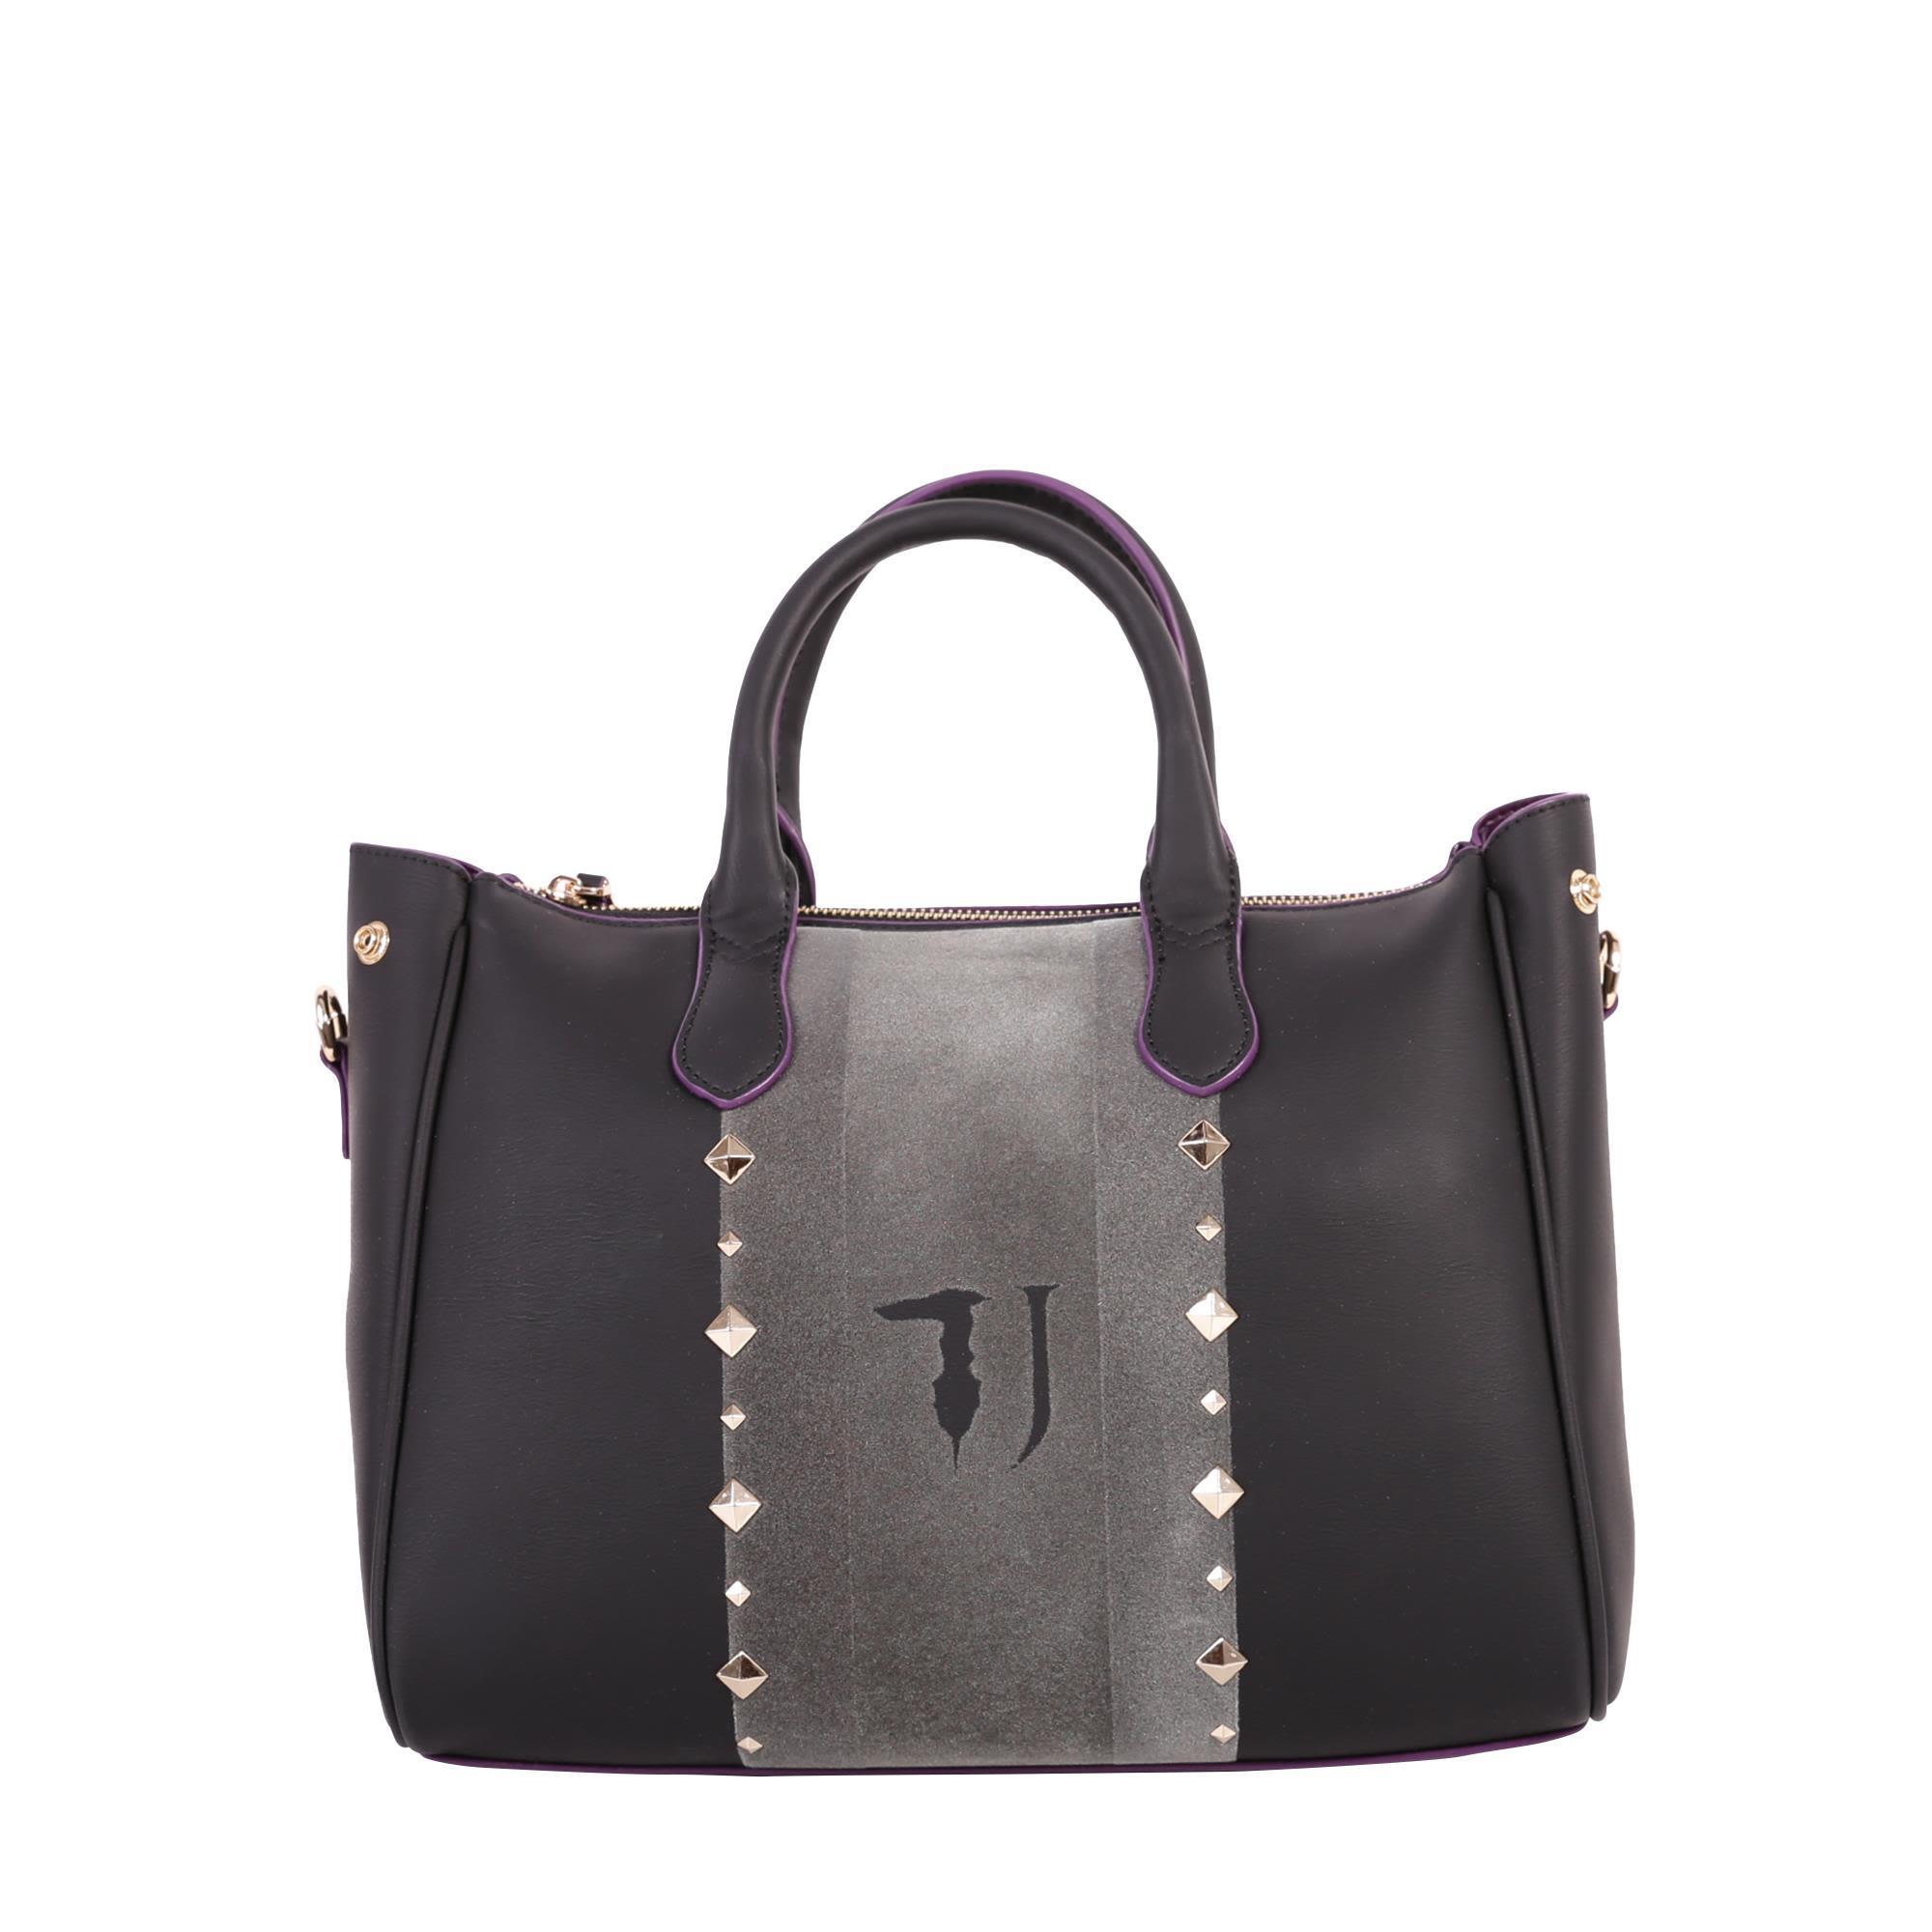 Trussardi Blondie Faux Leather Tote Bag In Black